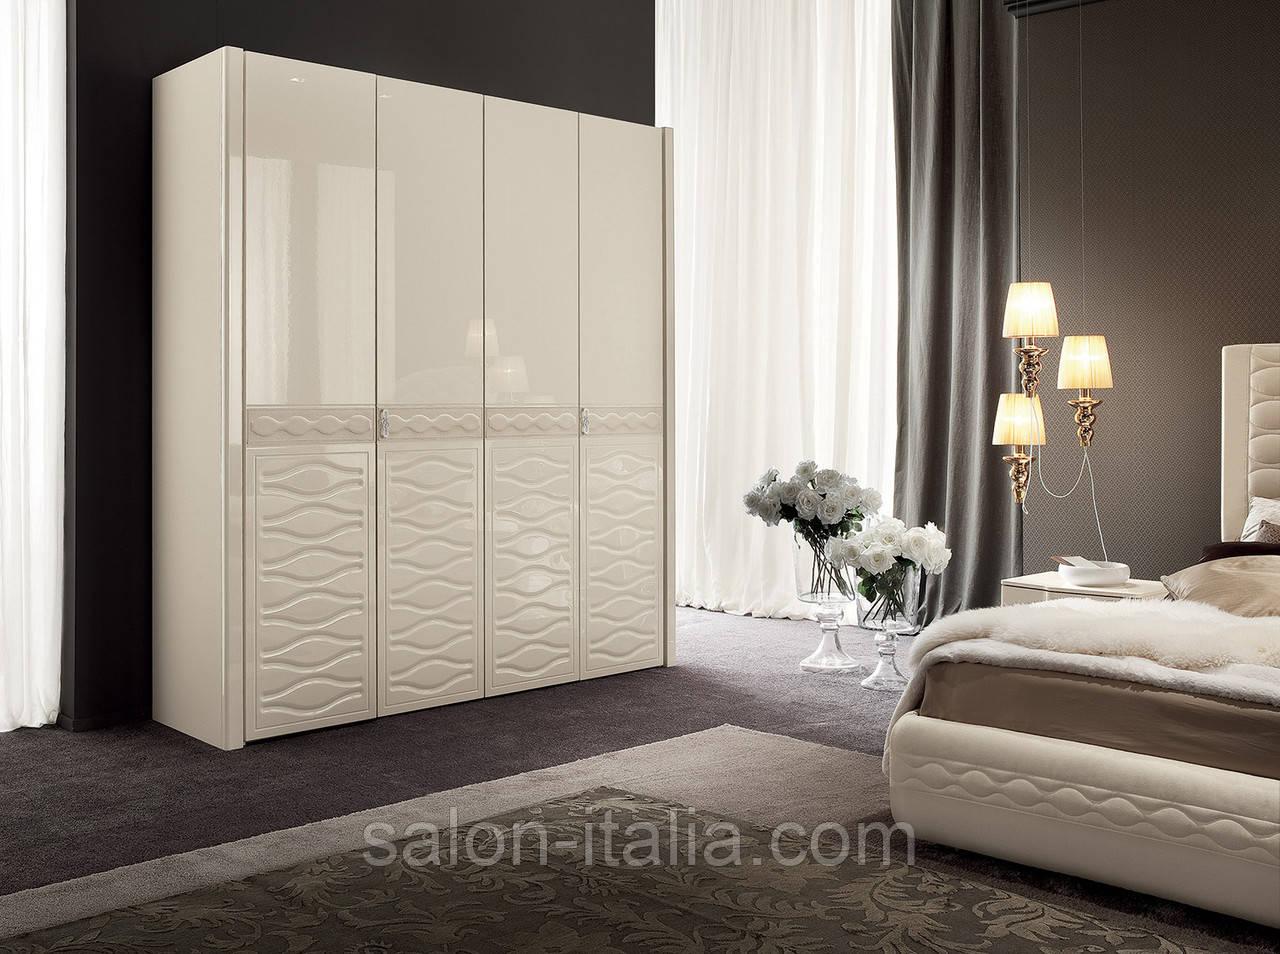 Итальянская спальня chanel фабрика dall agnese в ханты-манси.